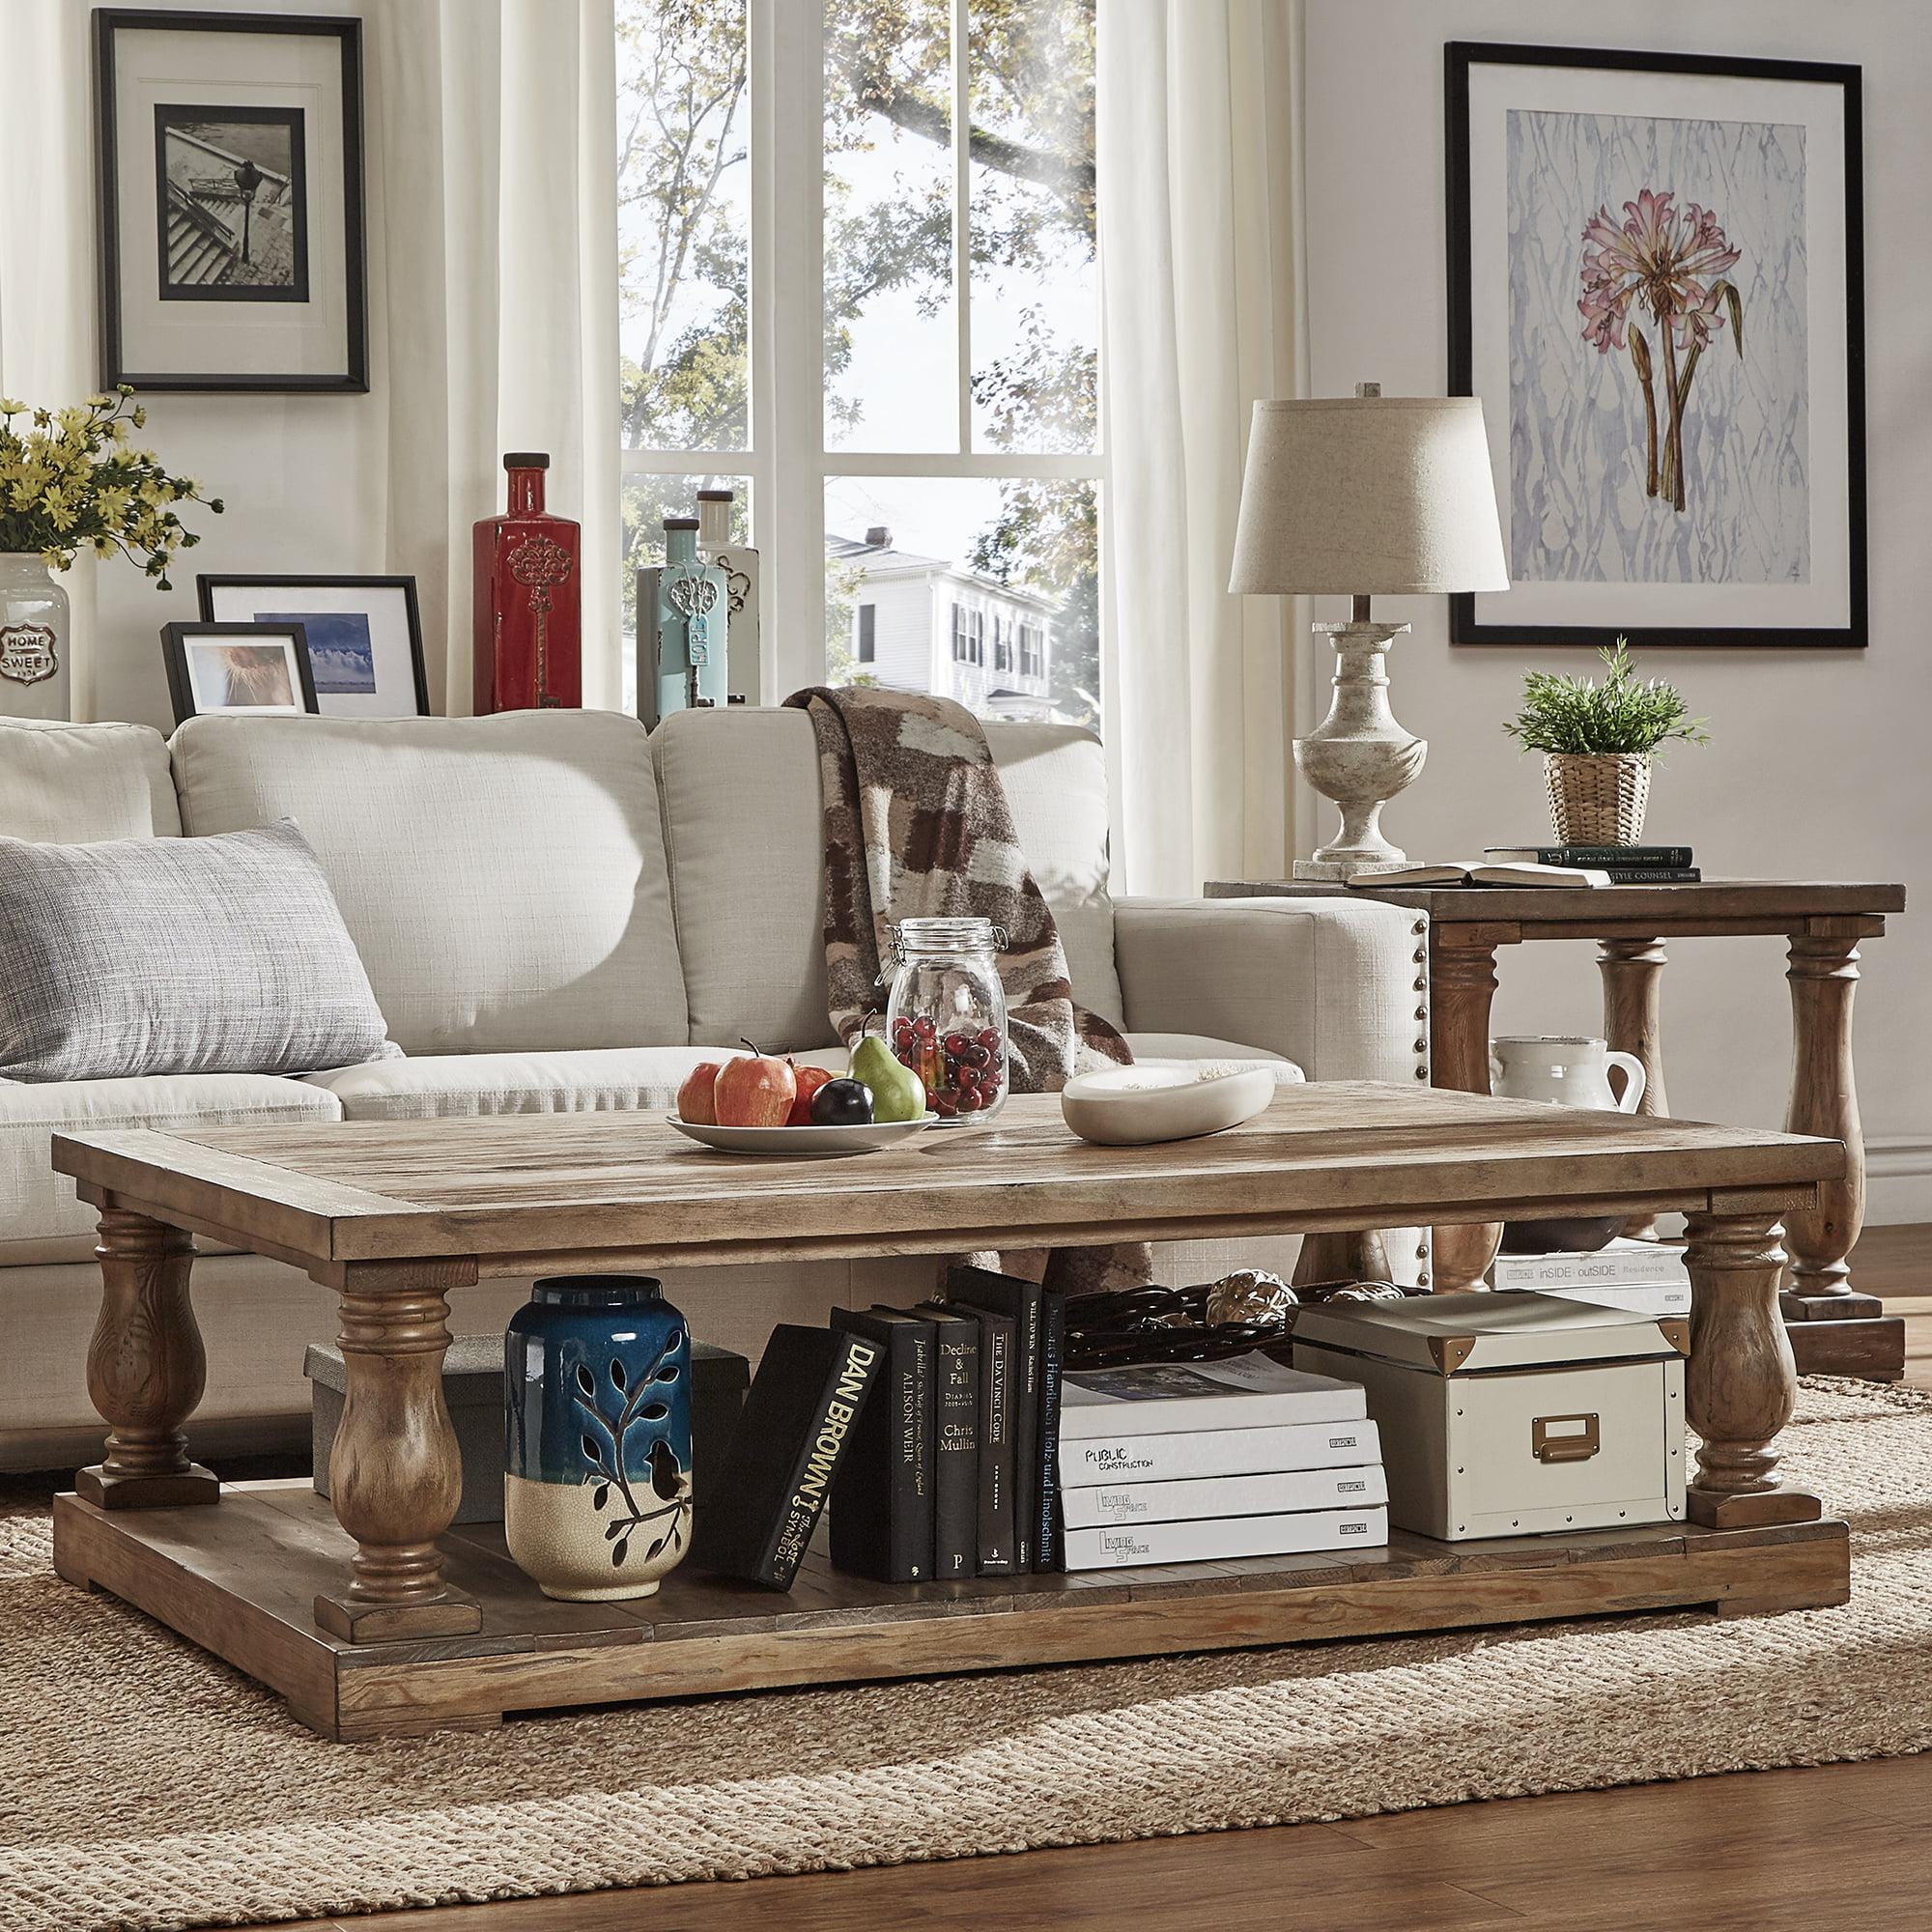 Weston Home Dunbar Pedestal Coffee Table With Lower Storage Shelf Pine Brown Walmart Com Walmart Com